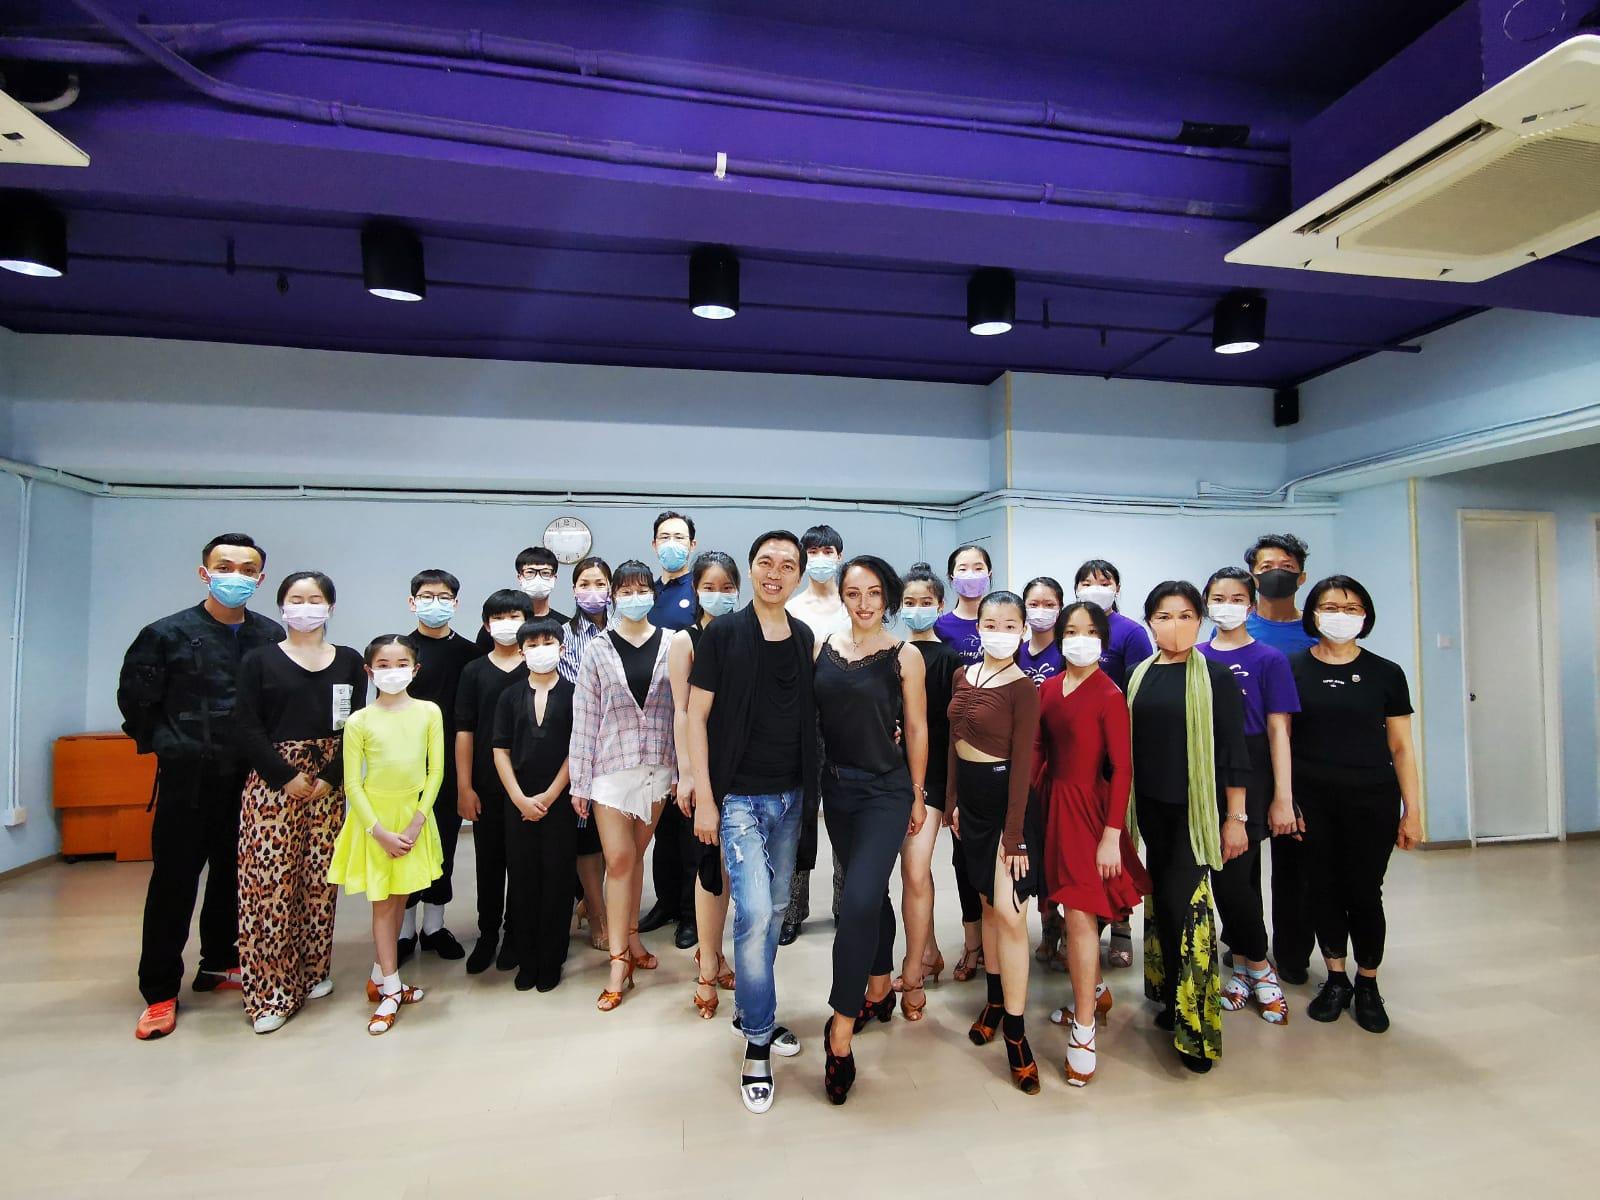 HKBDI 主辦第一循環拉丁舞講座